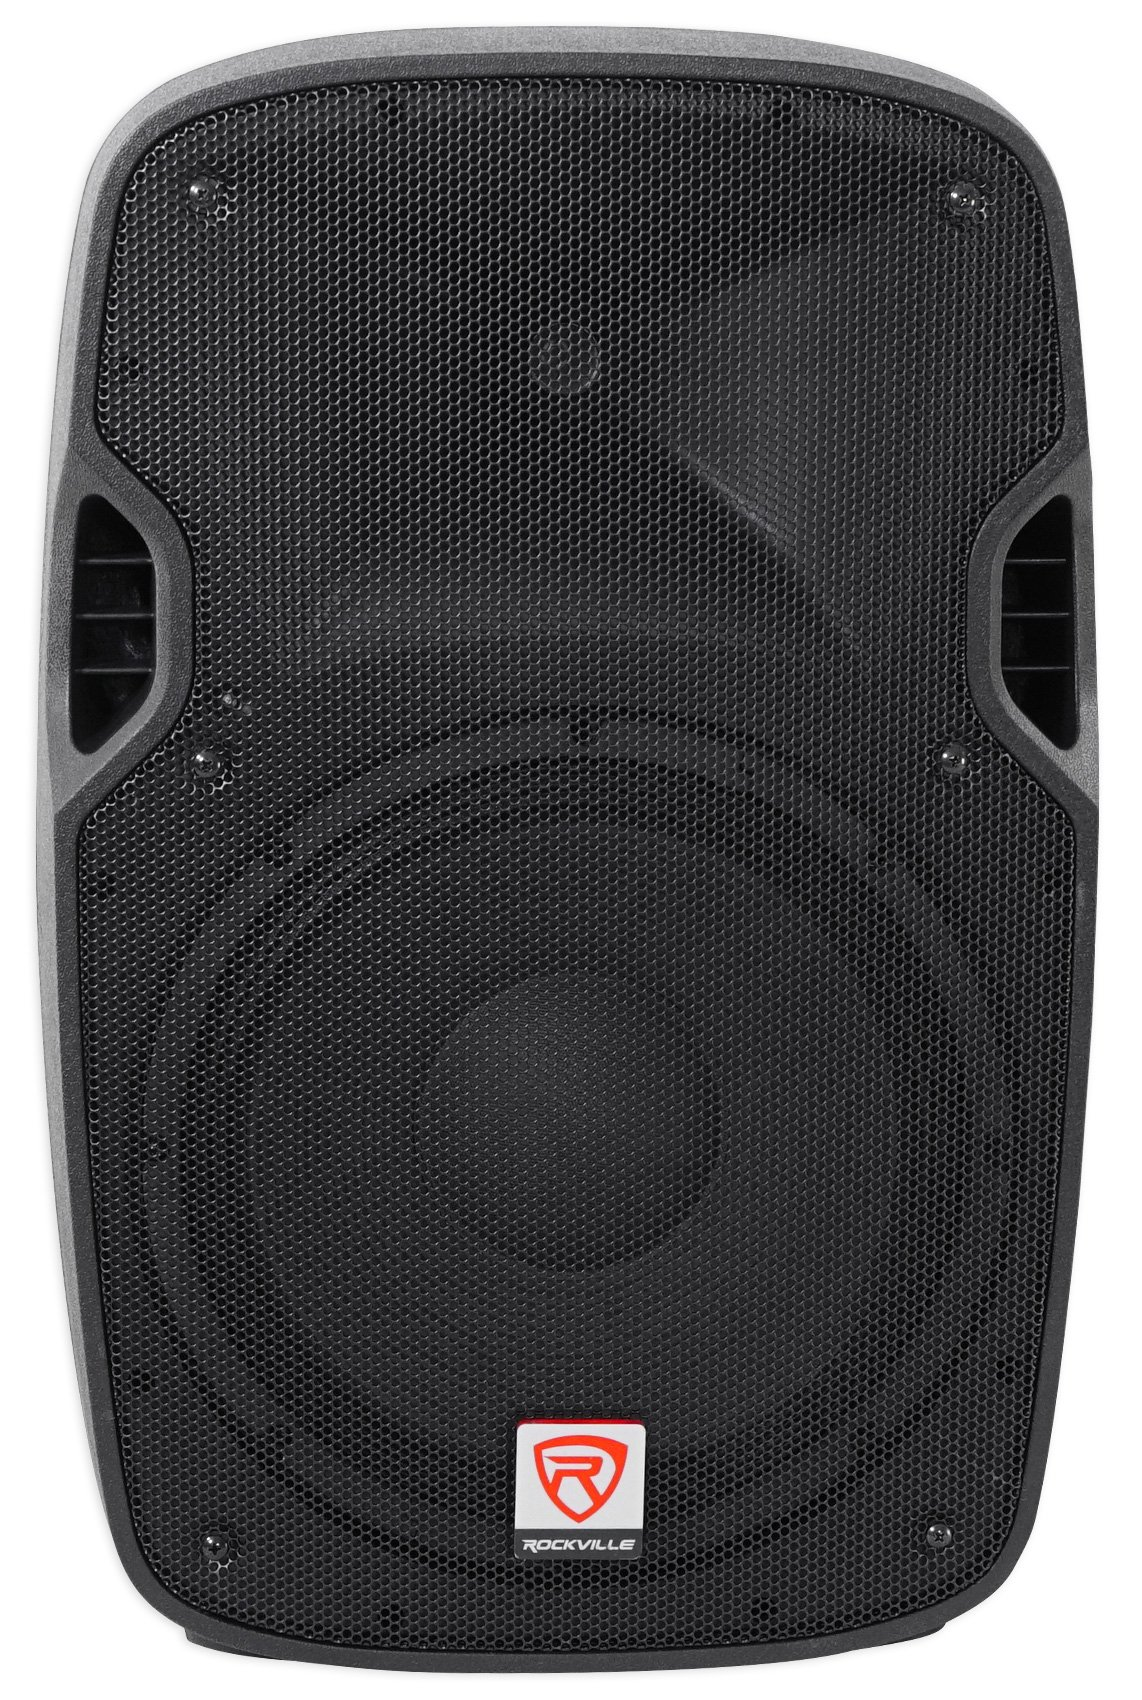 cheap 16 ohm speaker cabinet find 16 ohm speaker cabinet deals on rh guide alibaba com 16 ohm speaker cabinet wiring 16 ohm bass speaker cabinet